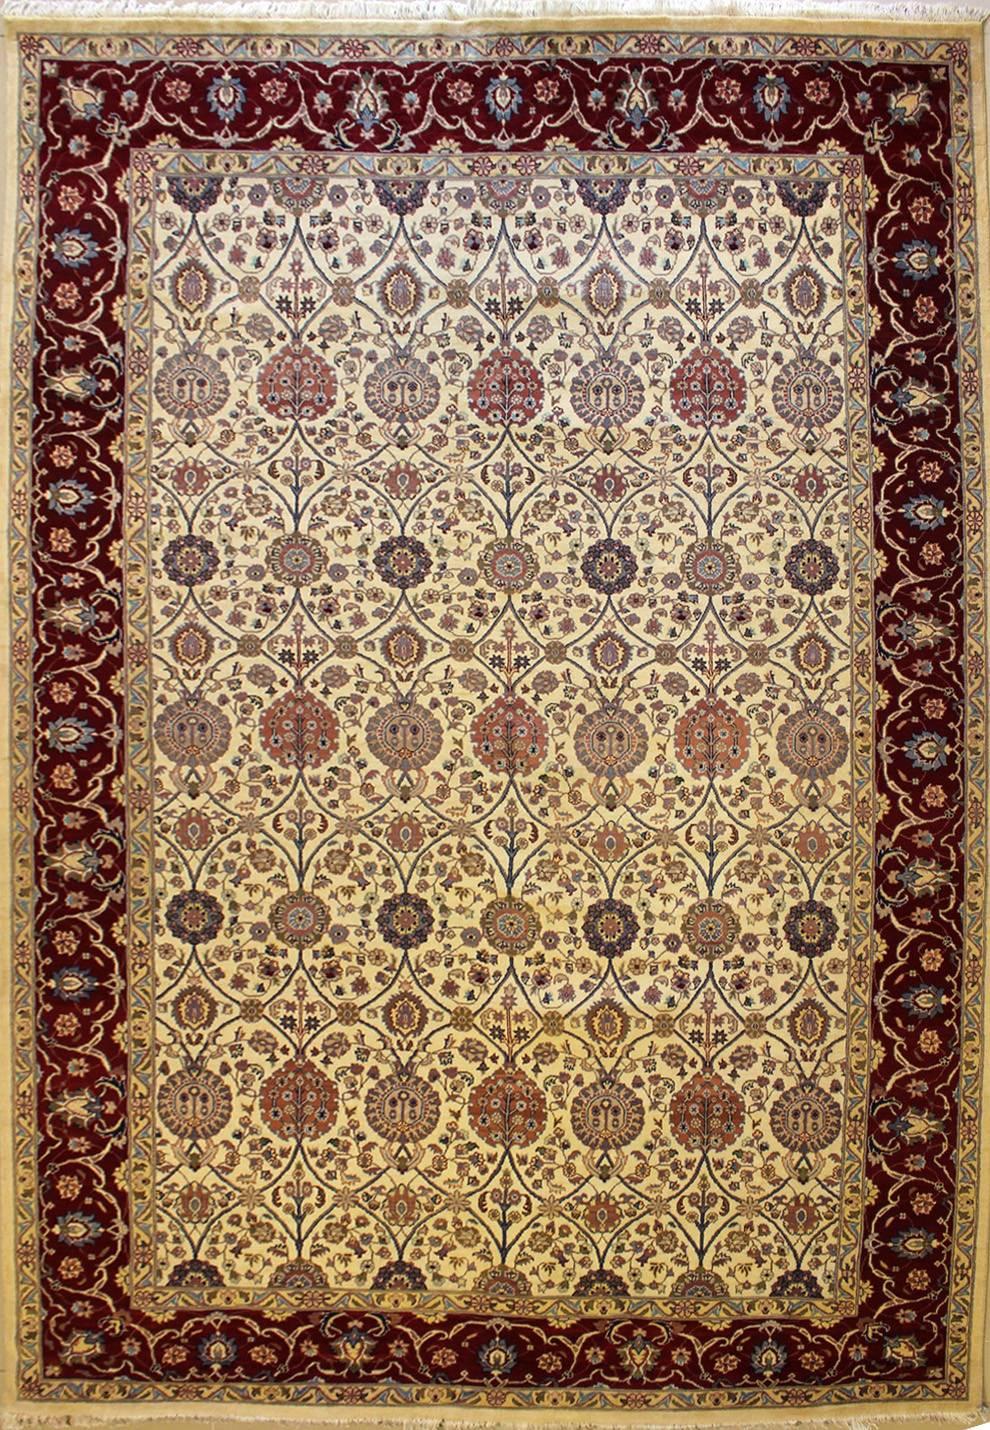 9 39 1x12 39 5 Rug Floral Handmade Pak Persian High Quality